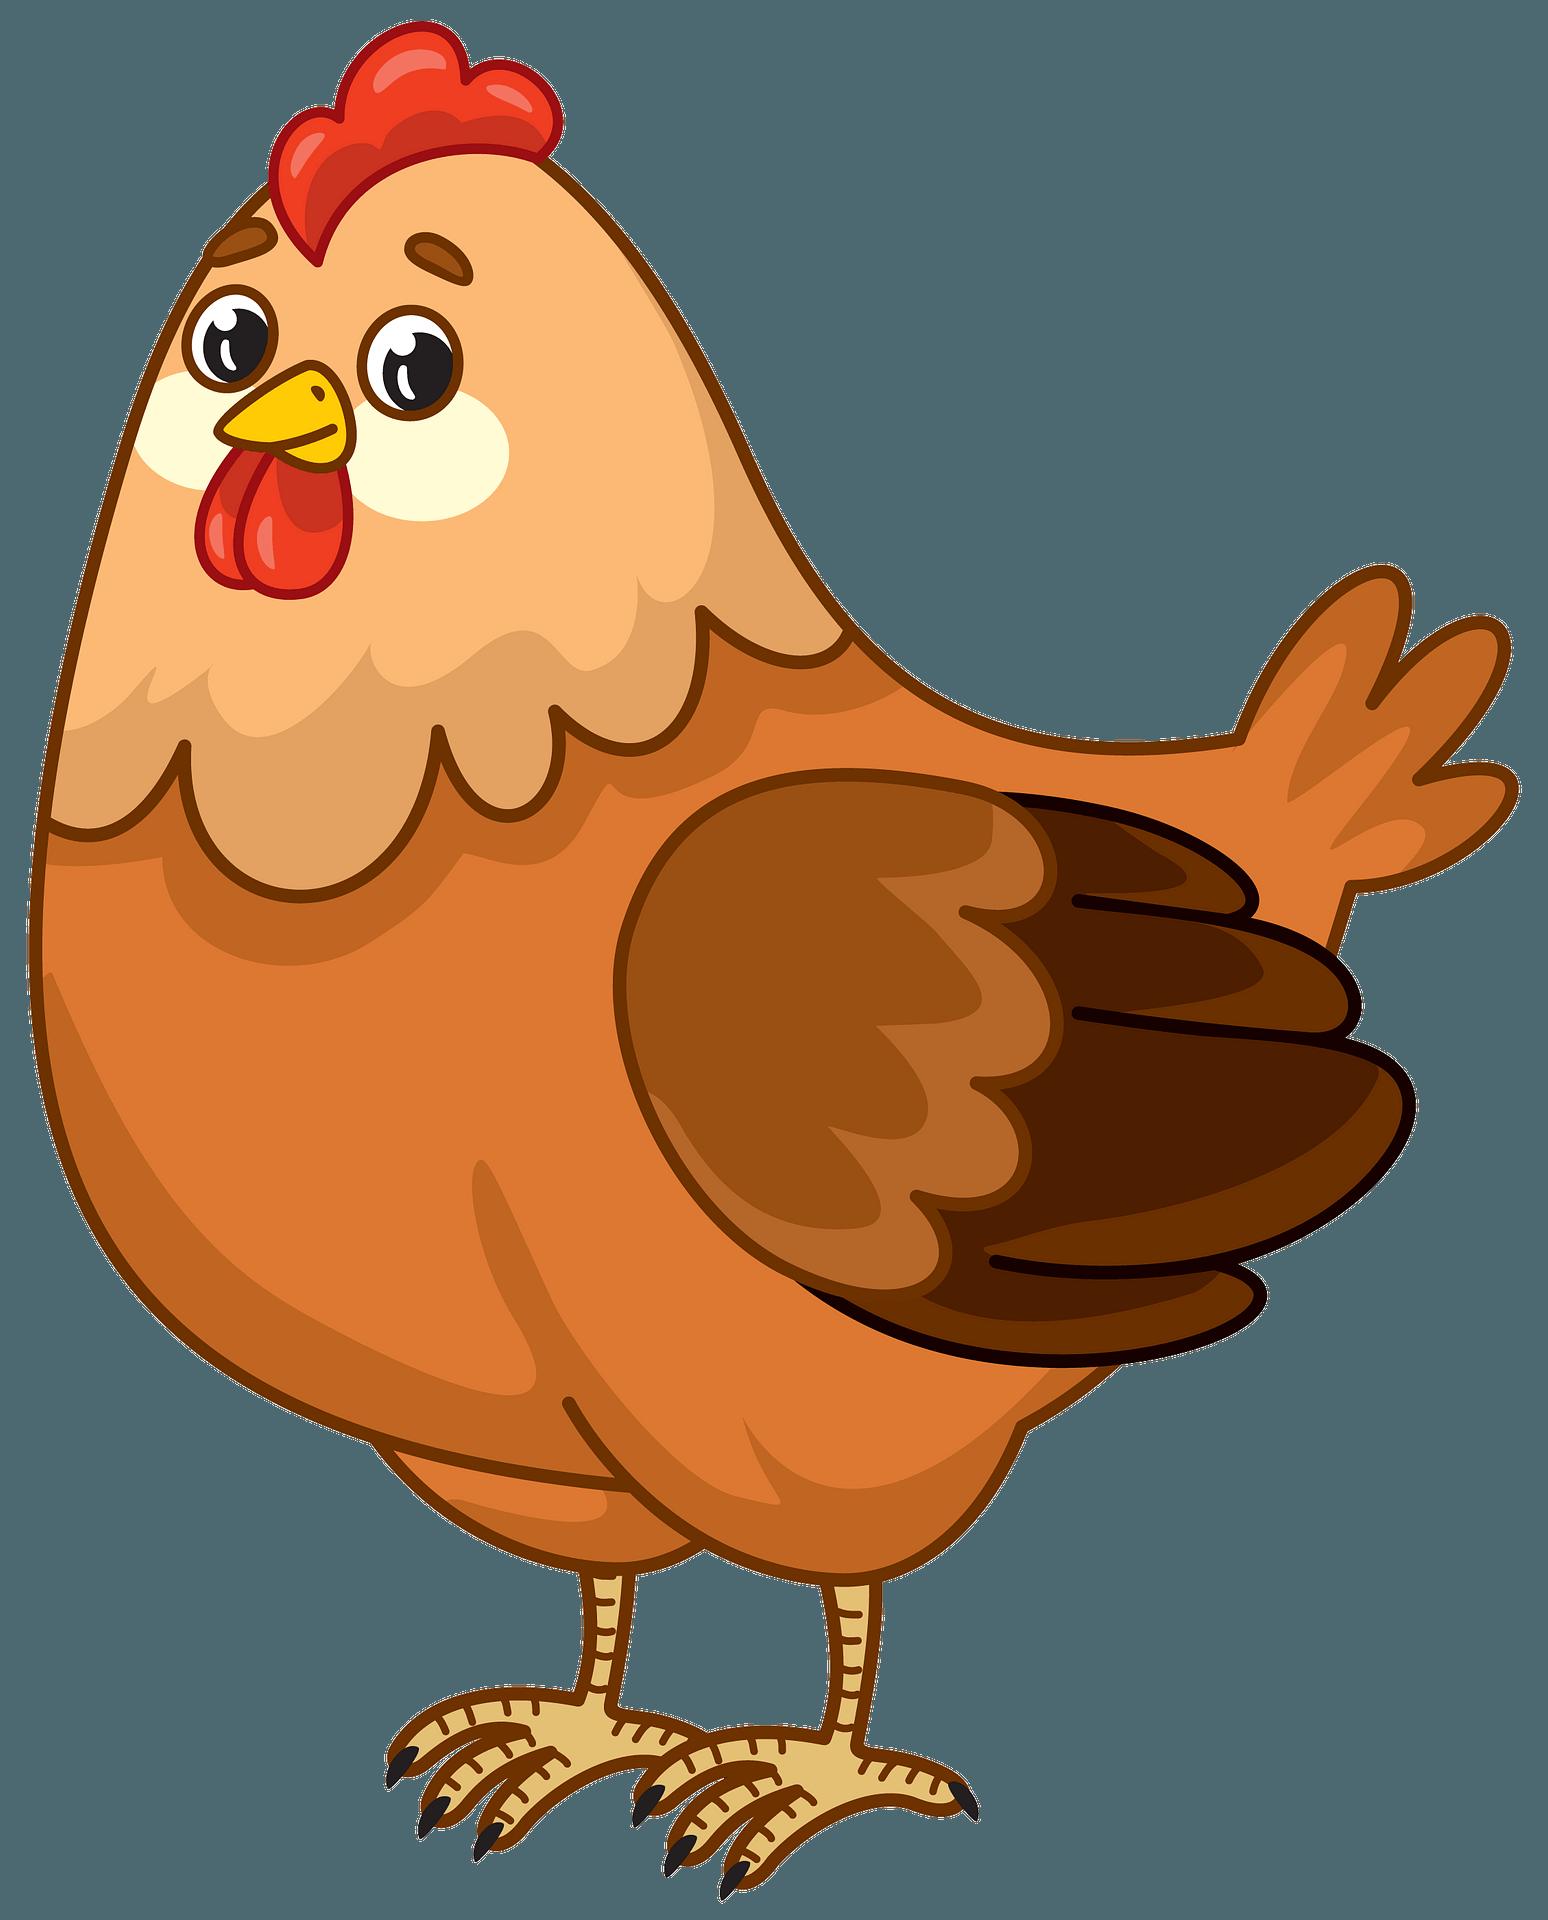 Chicken Clipart Free Download Transparent Png Creazilla